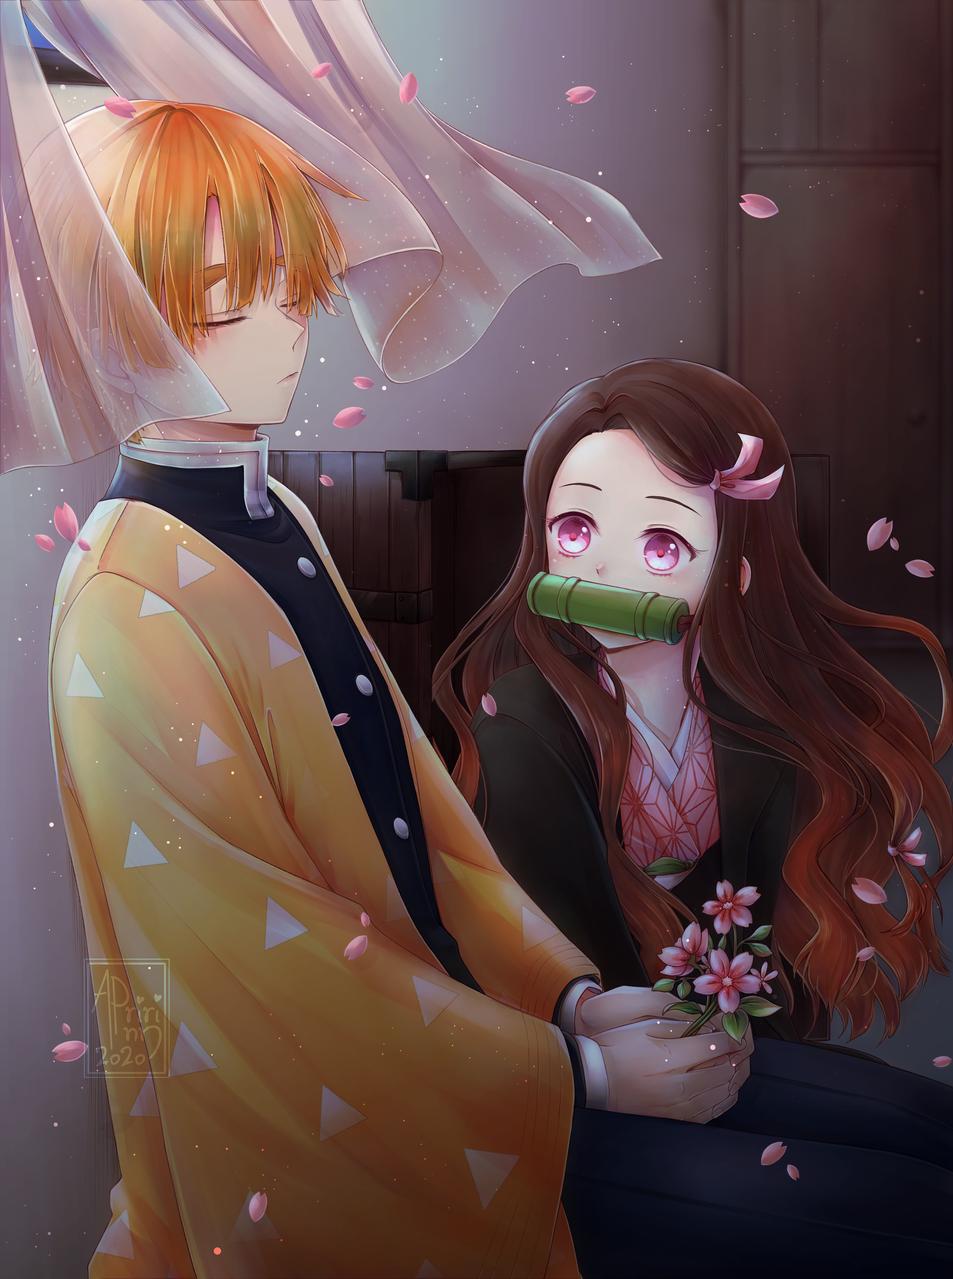 Next to you Illust of Apririnn (Onigiri) DemonSlayerFanartContest boy Zennezu girl KamadoNezuko KimetsunoYaiba flower cute AgatsumaZenitsu sleep